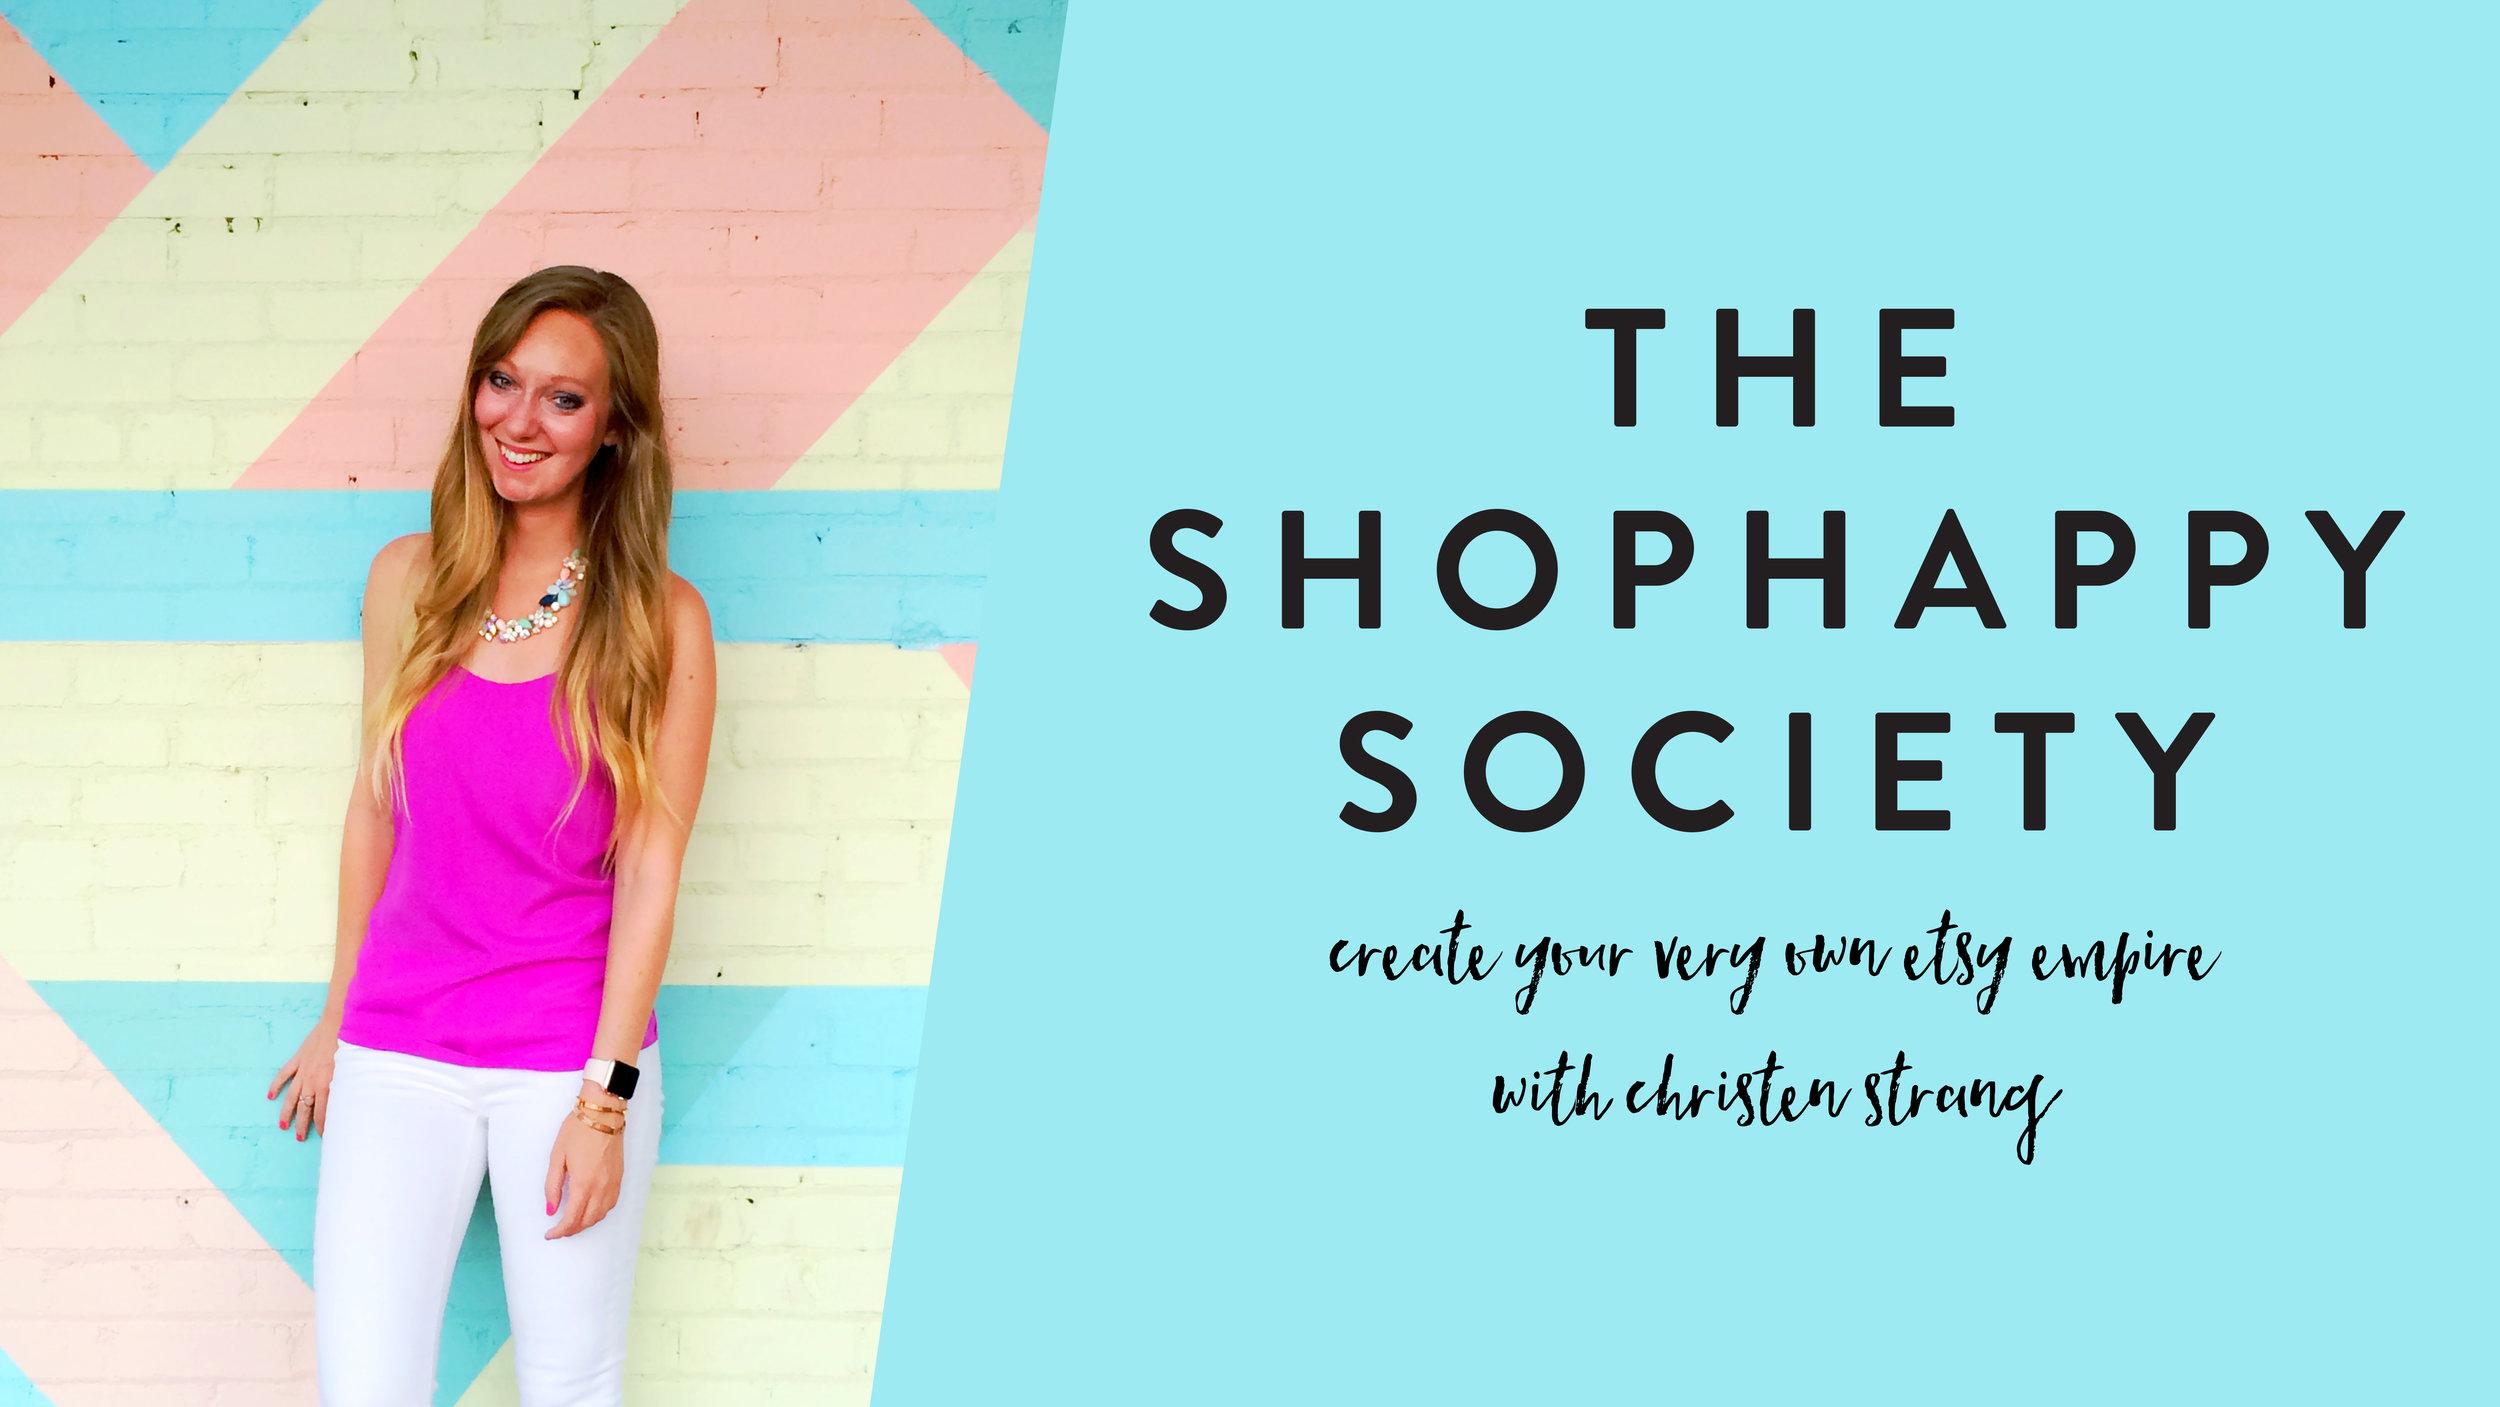 shophappysociety_facebookcover.jpg